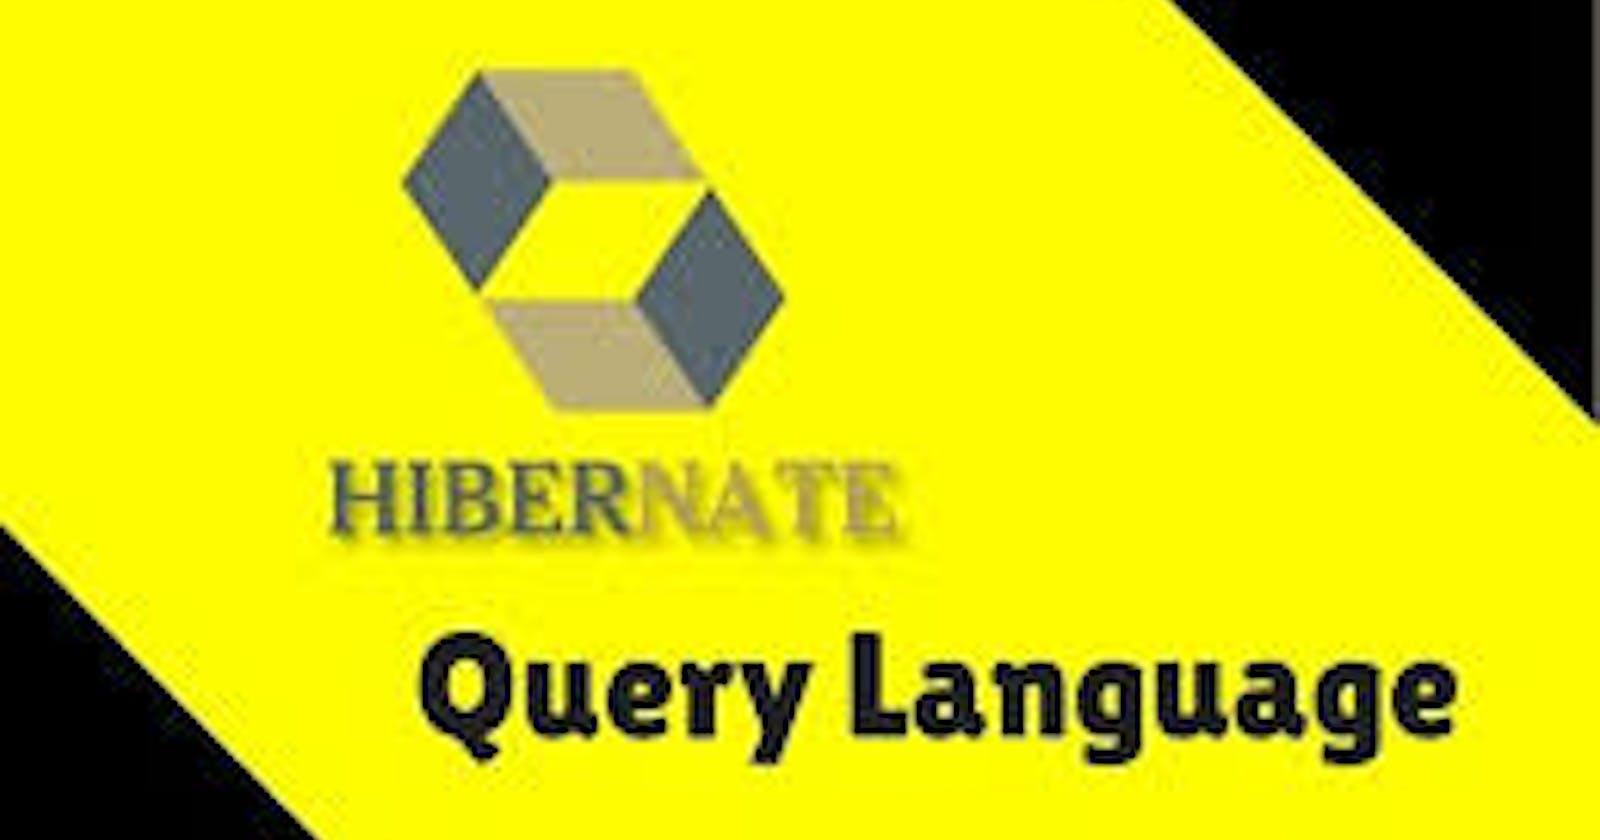 Hibernate Query Language - HQL